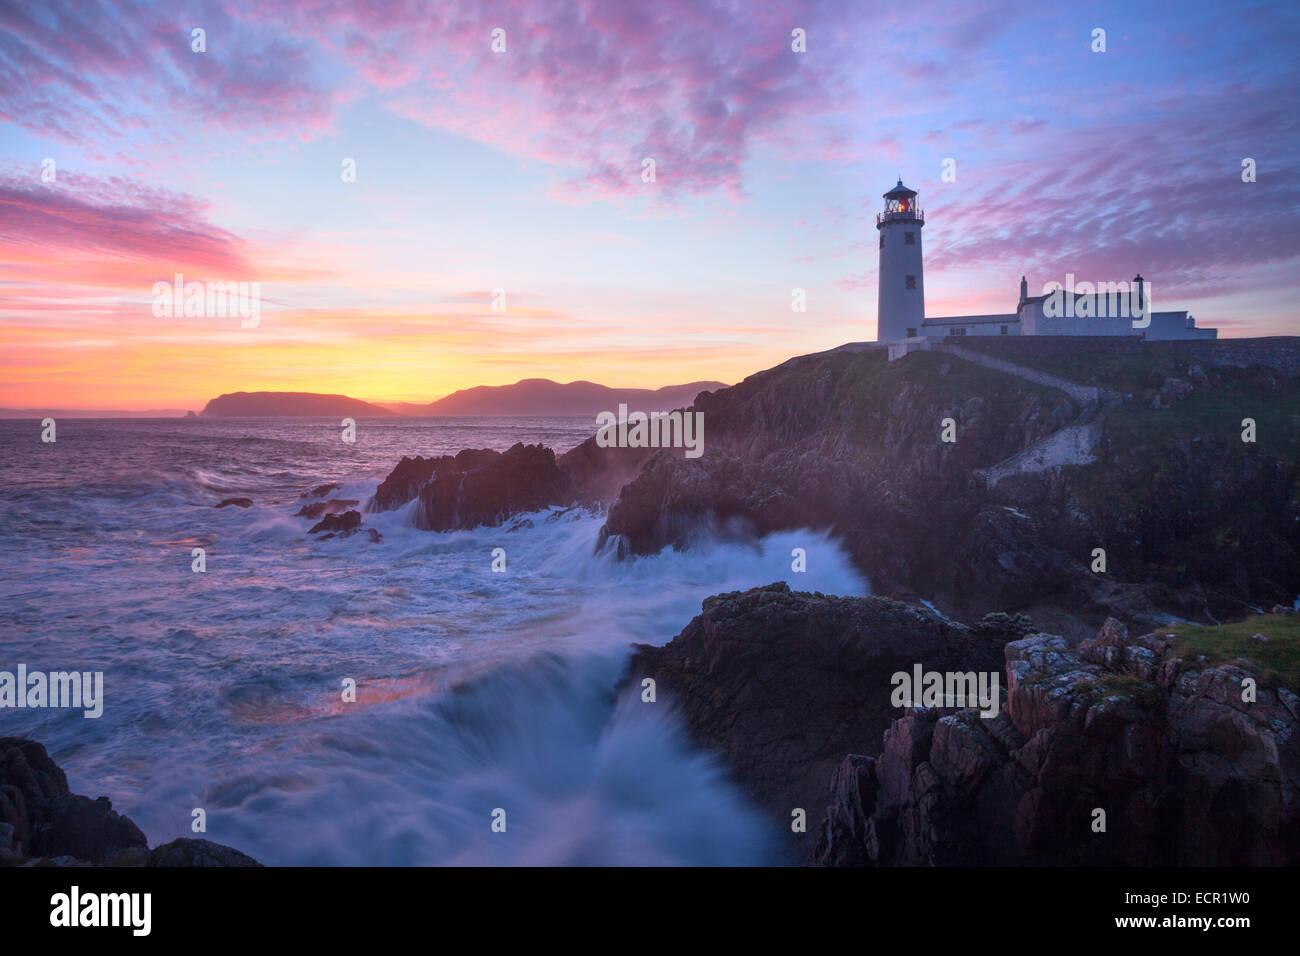 Sunrise over Fanad Head Lighthouse, Fanad Head, County Donegal, Ireland. Stock Photo